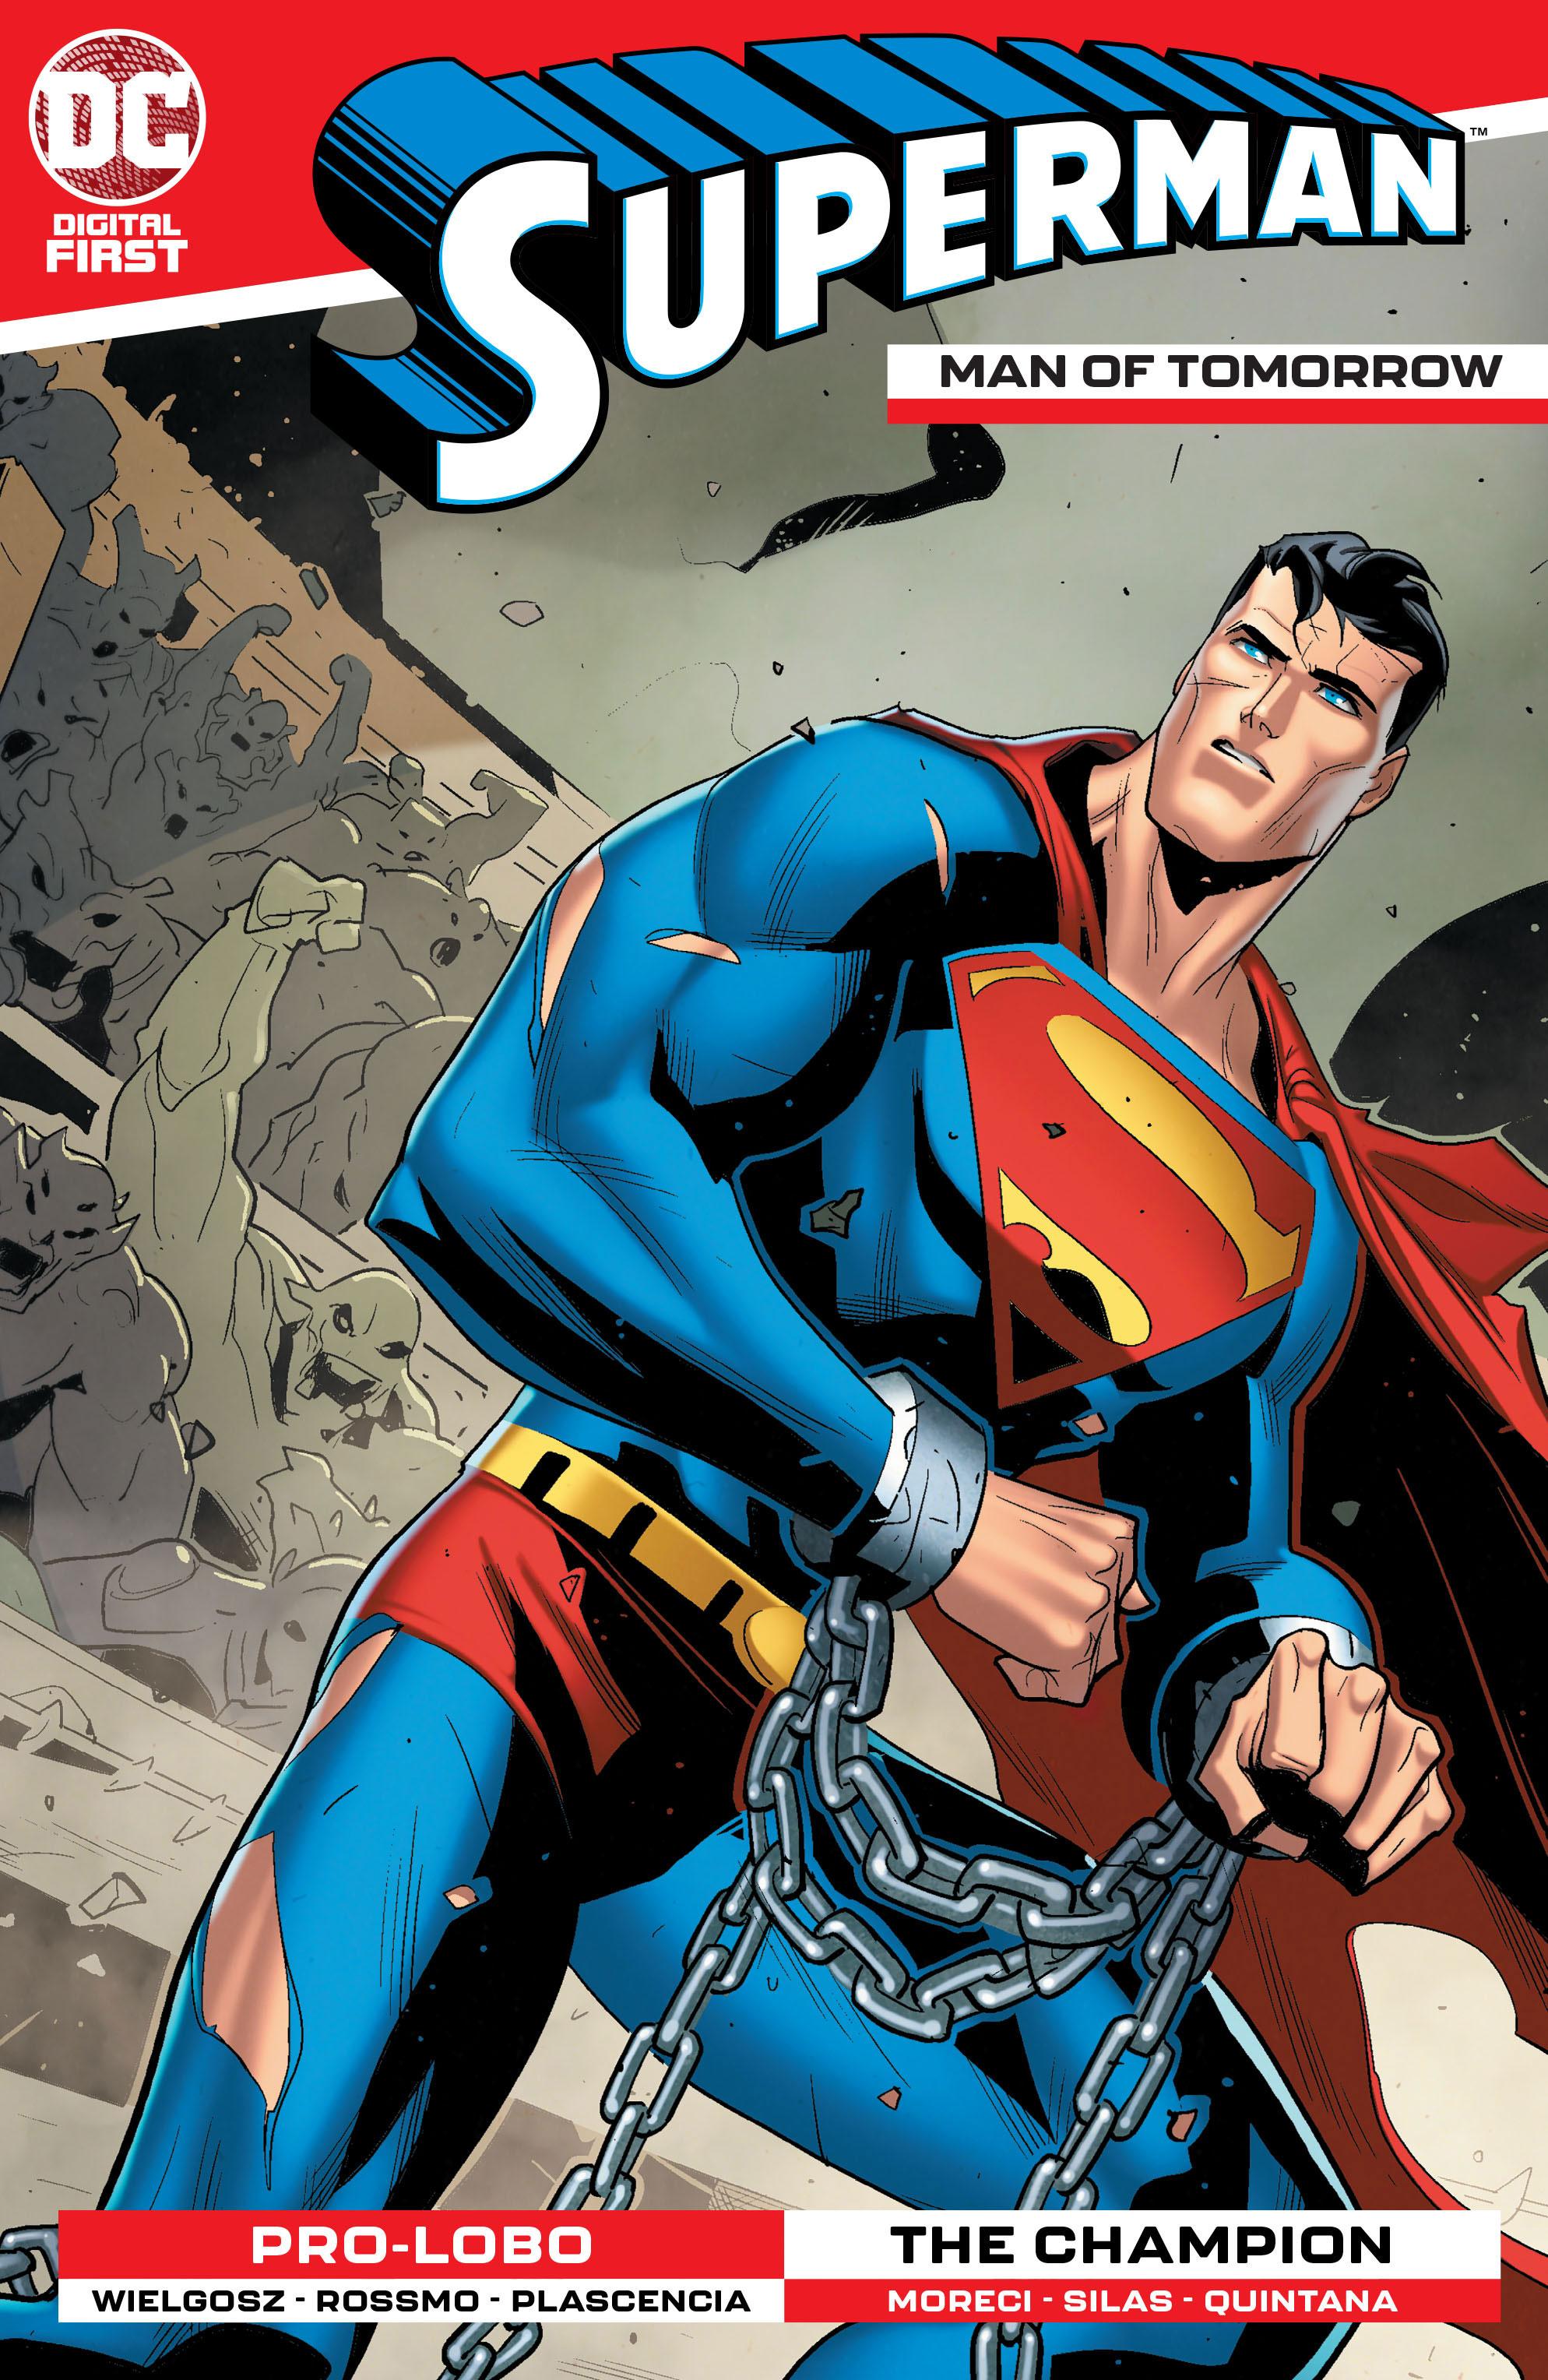 SUPERMAN-THE-MAN-OF-TOMORROW-Cv10